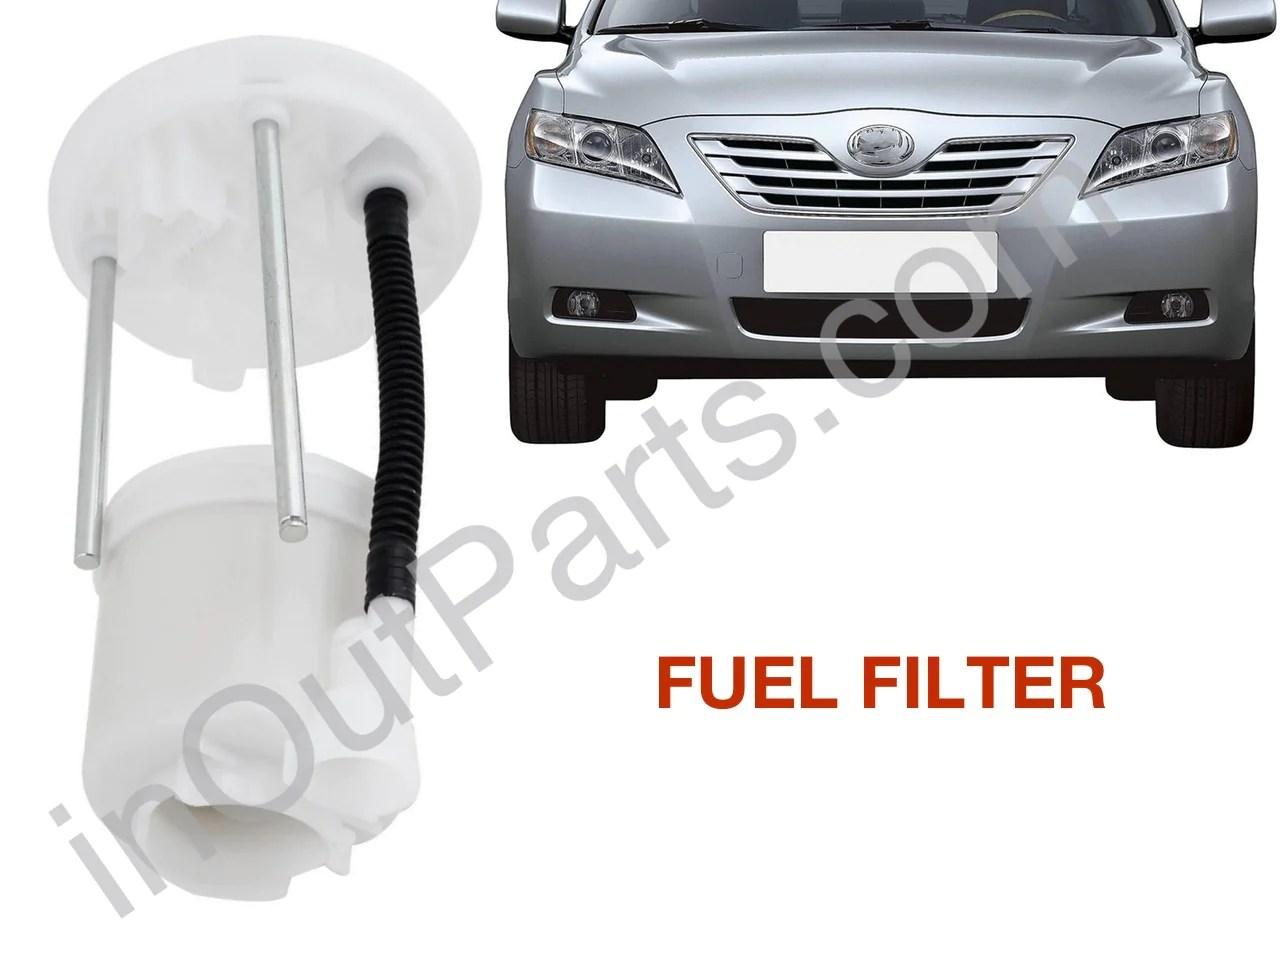 small resolution of 2007 pontiac grand prix fuel filter